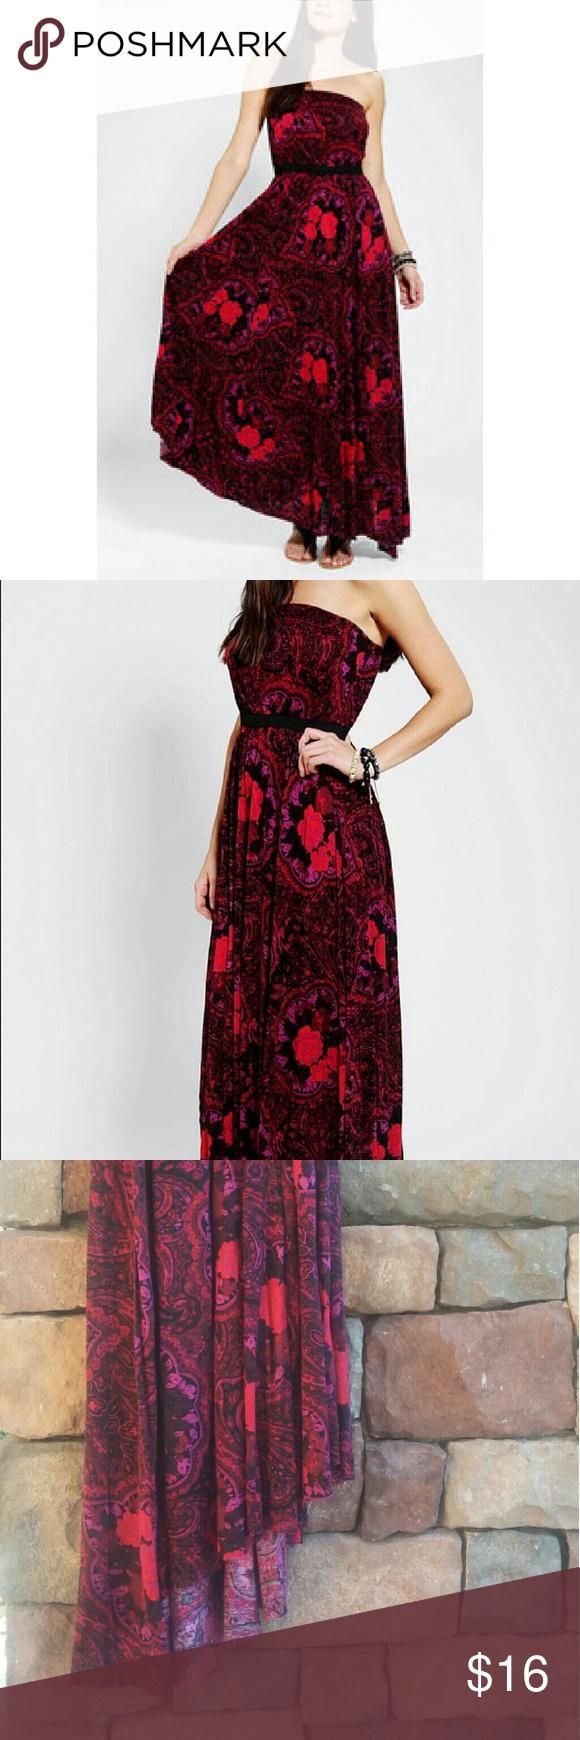 Uo ecote rosarita maxi dress urban outfitters dress urban